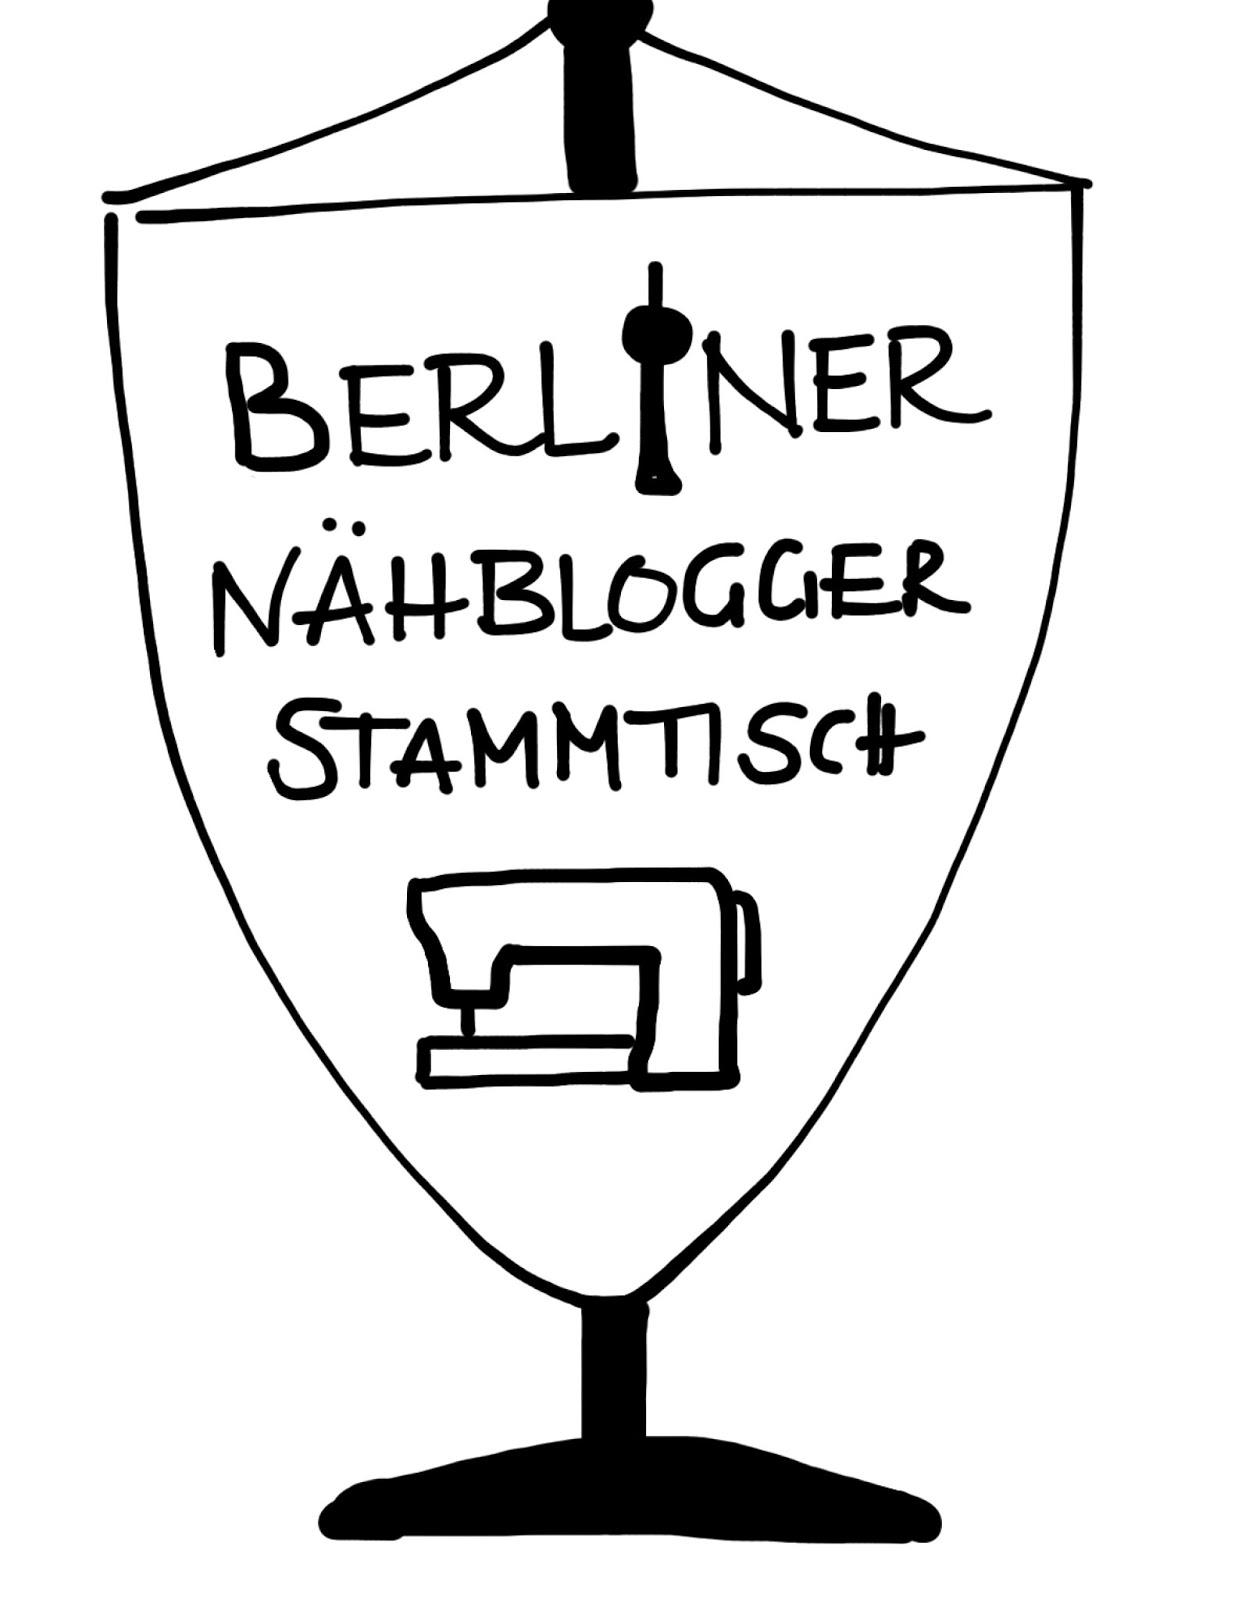 Berliner Nähblogger-Stammtisch